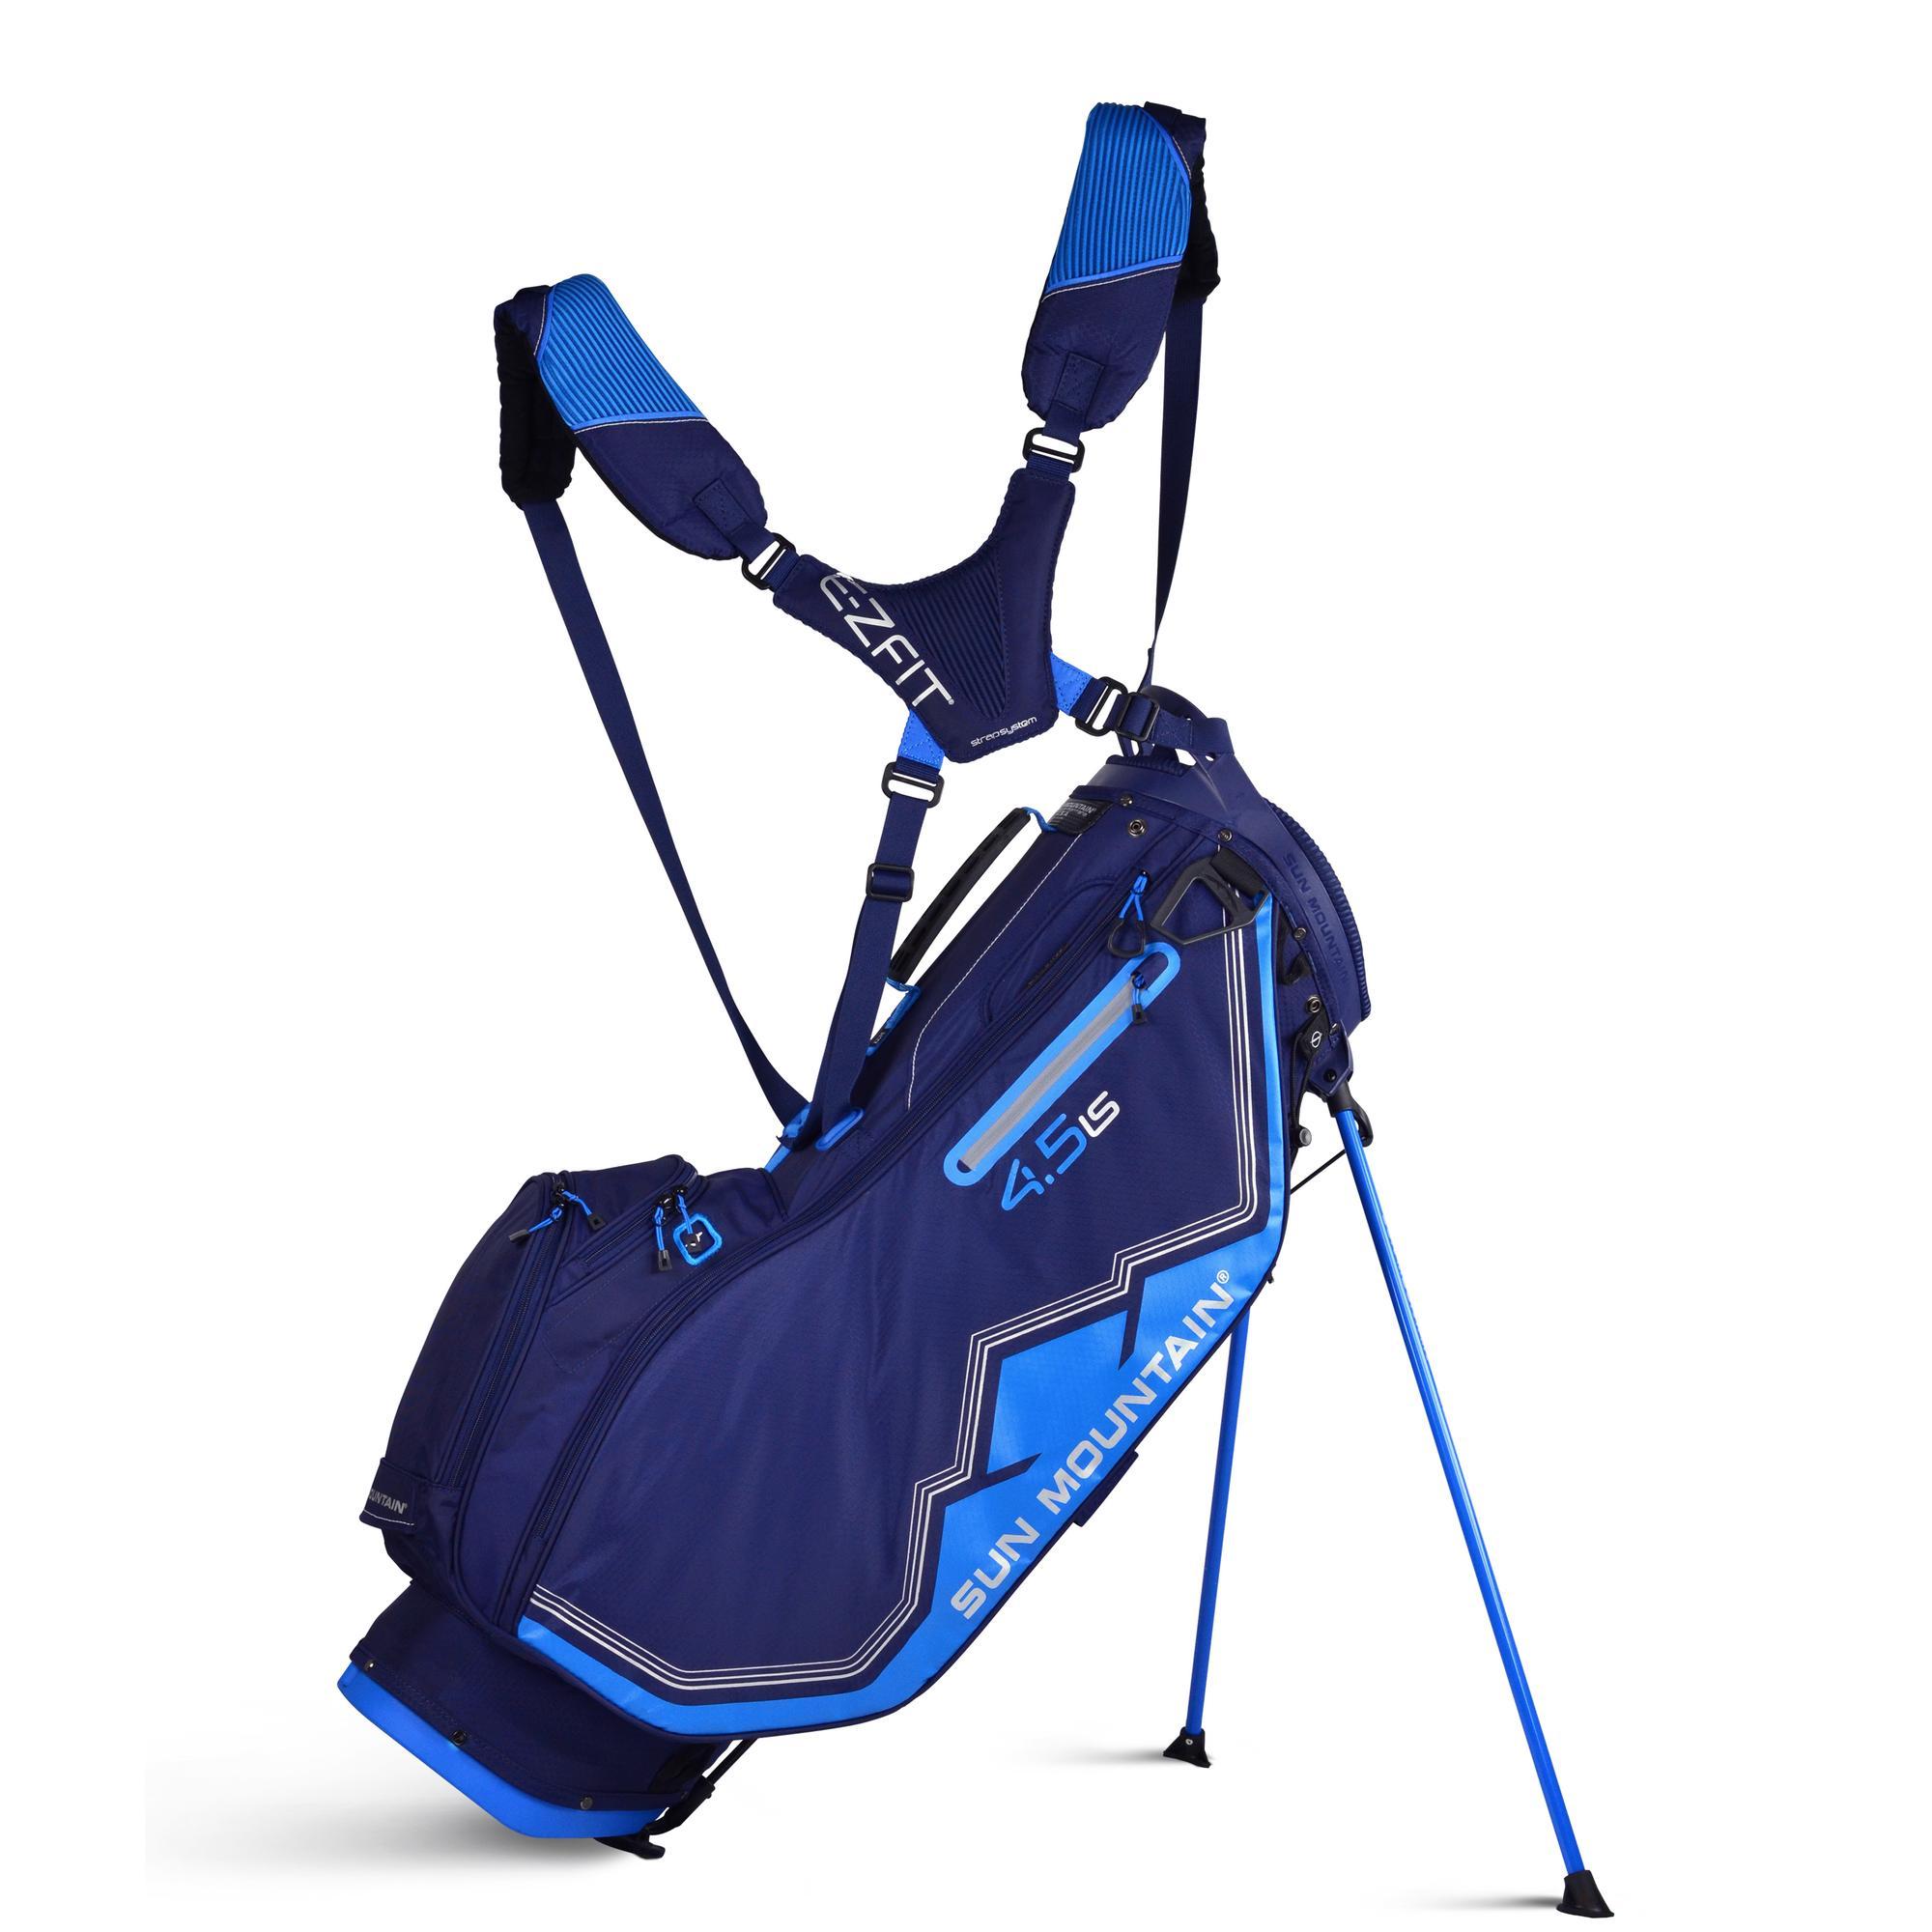 Women's 4.5 LS Stand Bag